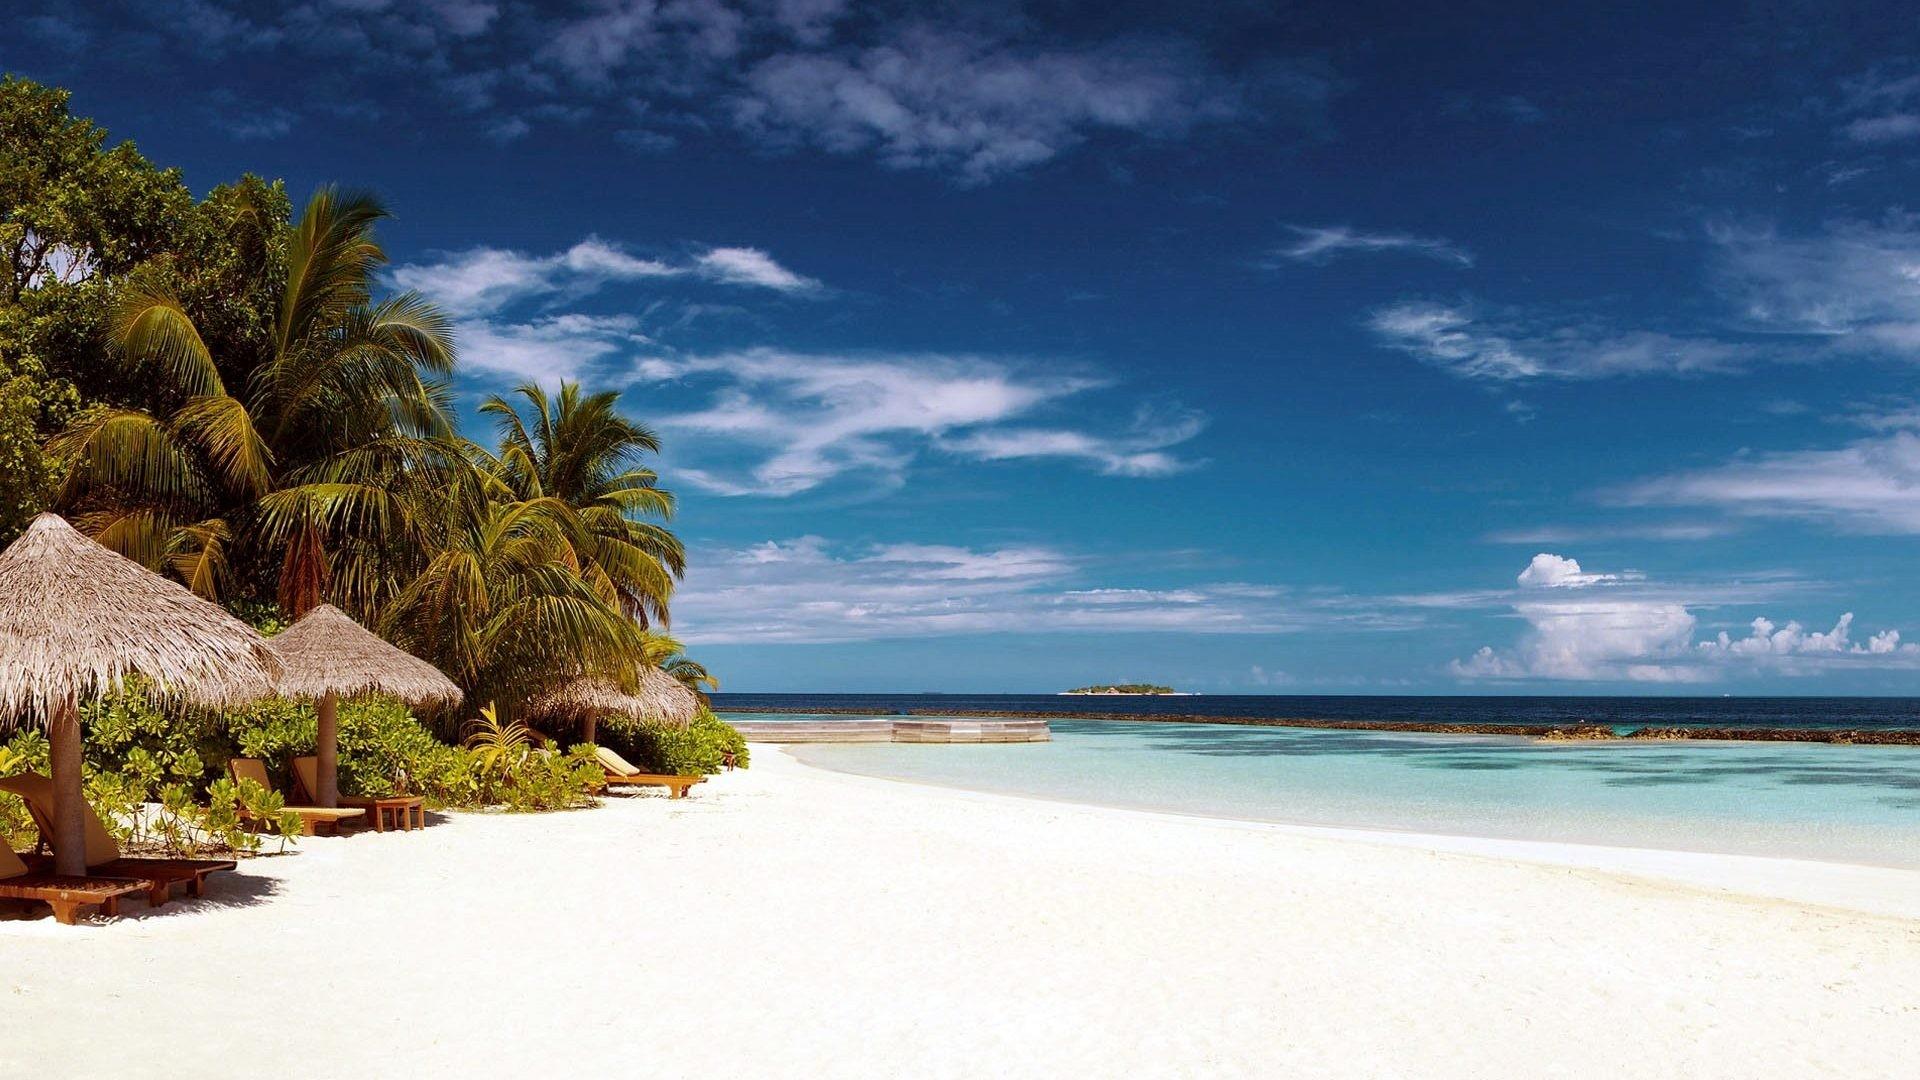 Sand Clouds Sunshades Sea Sky Beautiful Trees Summer Tropical Palm Beach  Caribbean White Wallpaper Tablet – 1920×1084